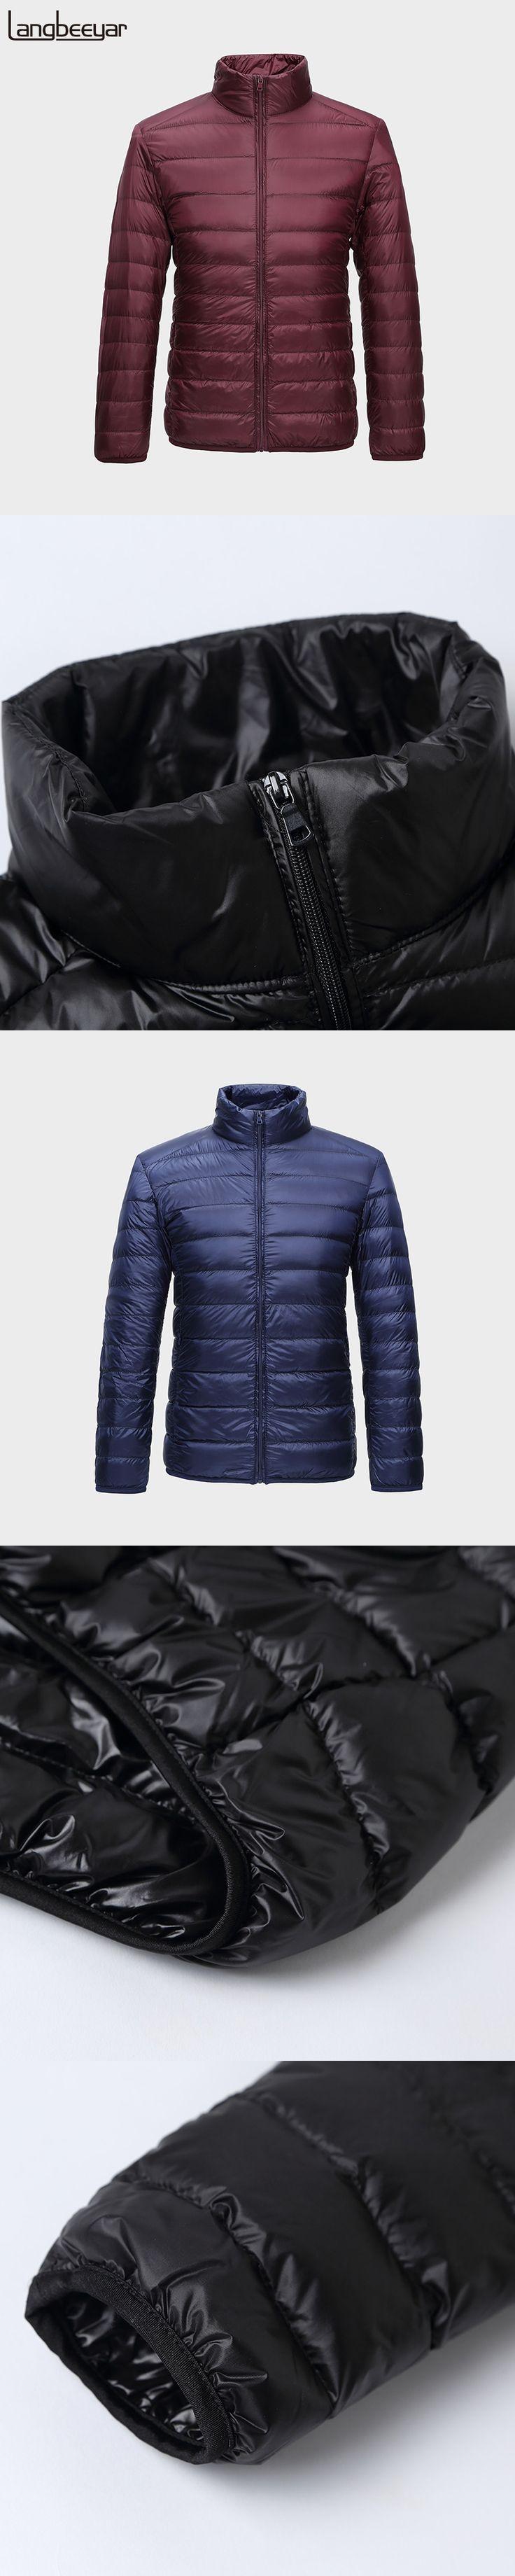 New Fashion 90% Ultra Light Down Jacket Men Top Grade Winter Jacket Men Parka Stand Collar Mens Winter Jackets And Coats S-3XL